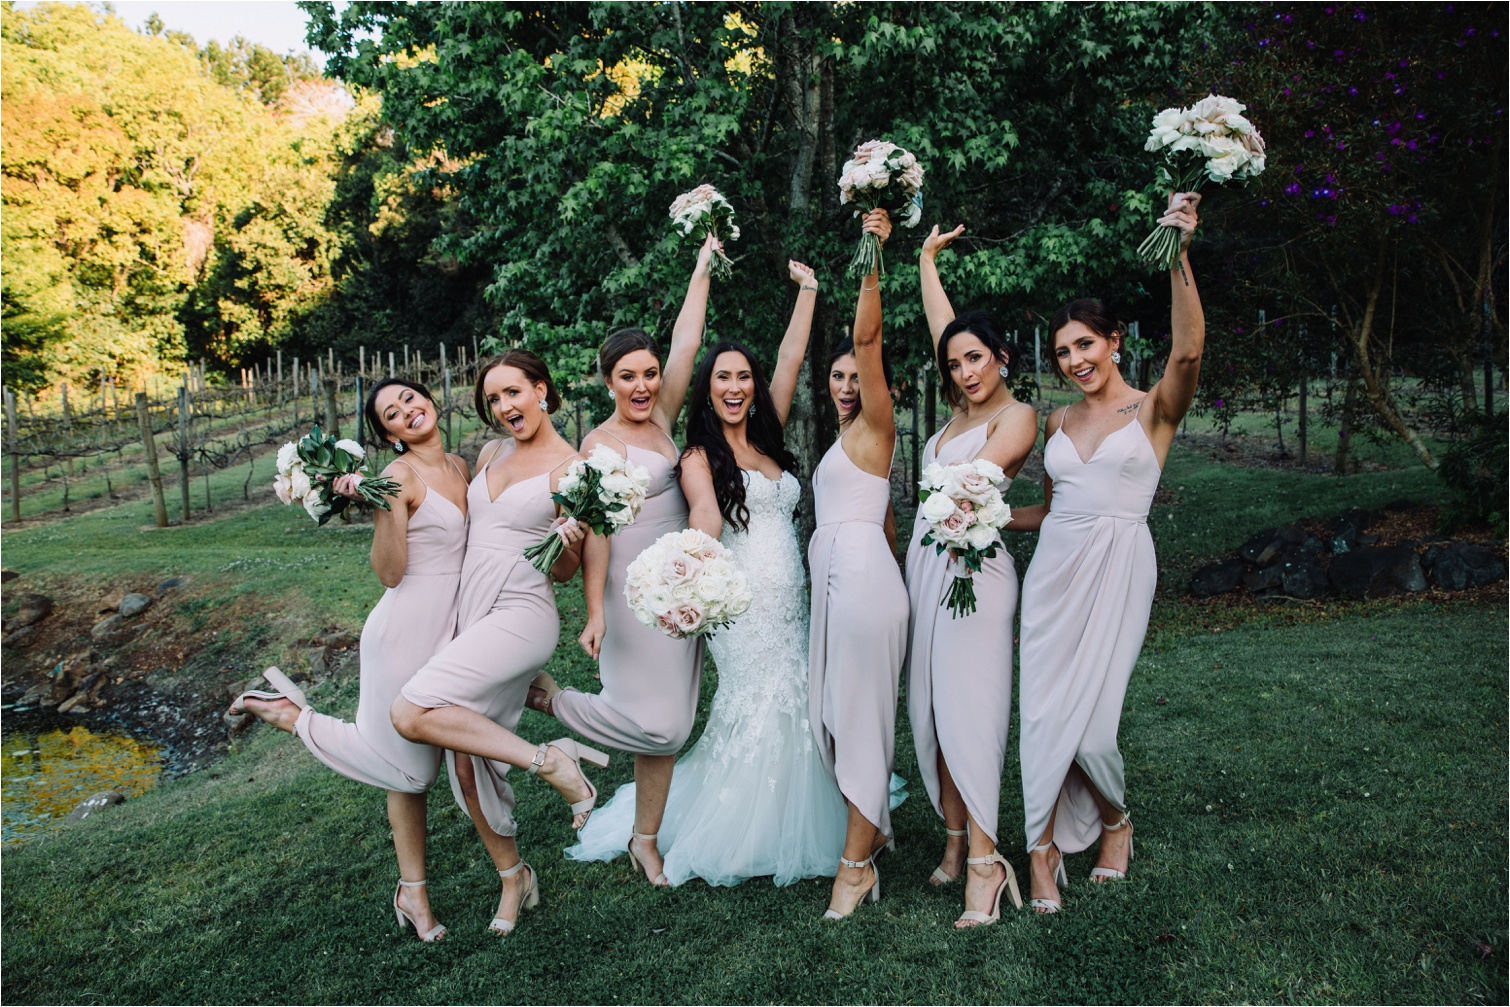 Maleny Manor Wedding Photography - Gold Coast Wedding Photographer_0038.jpg